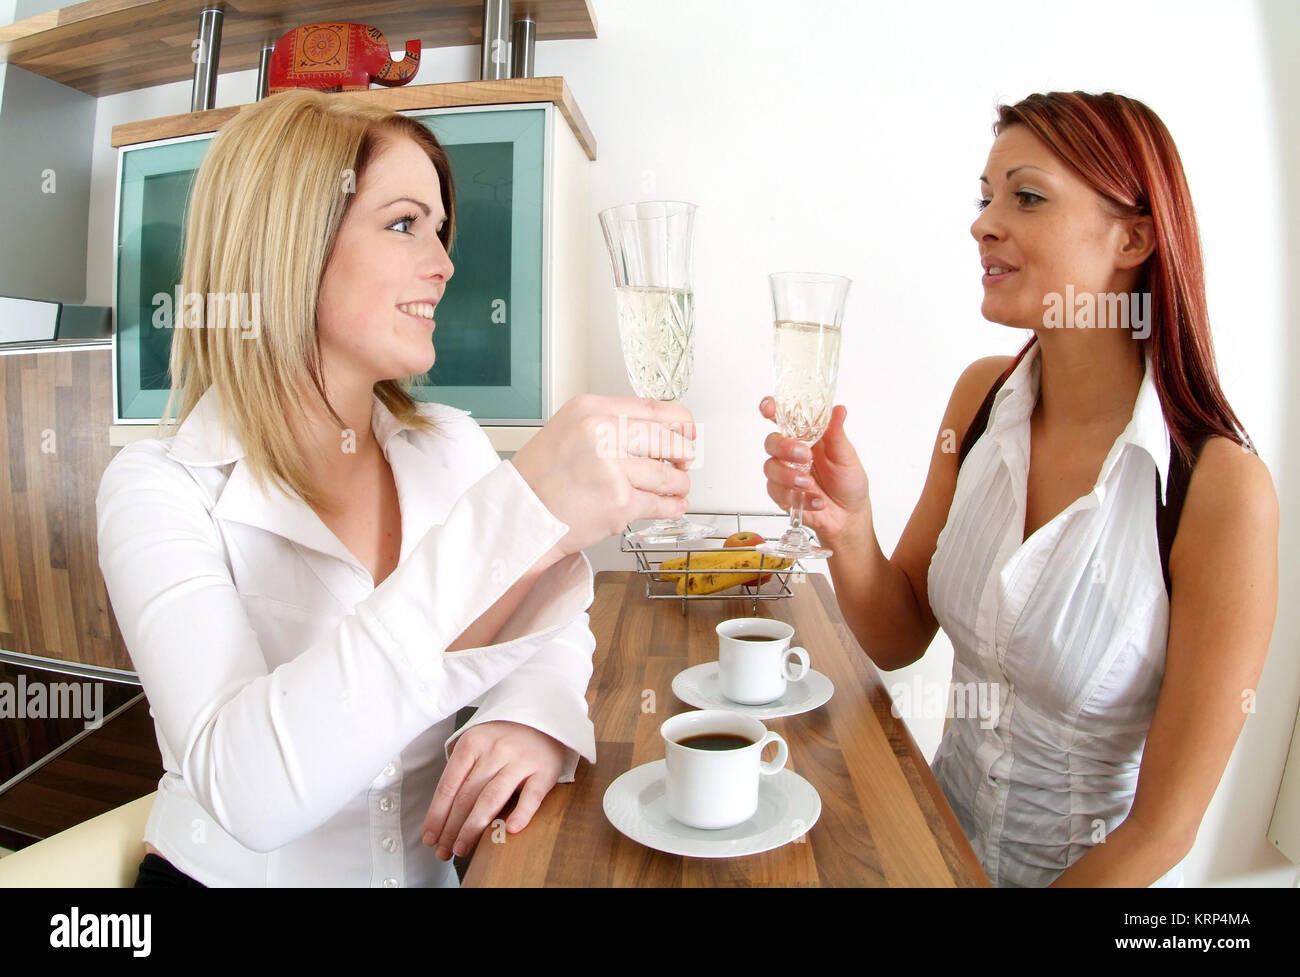 Zwei junge Frauen trinken gemeinsam Sekt an der Kuechenbar - two young women drinking sparkling wine - Stock Image